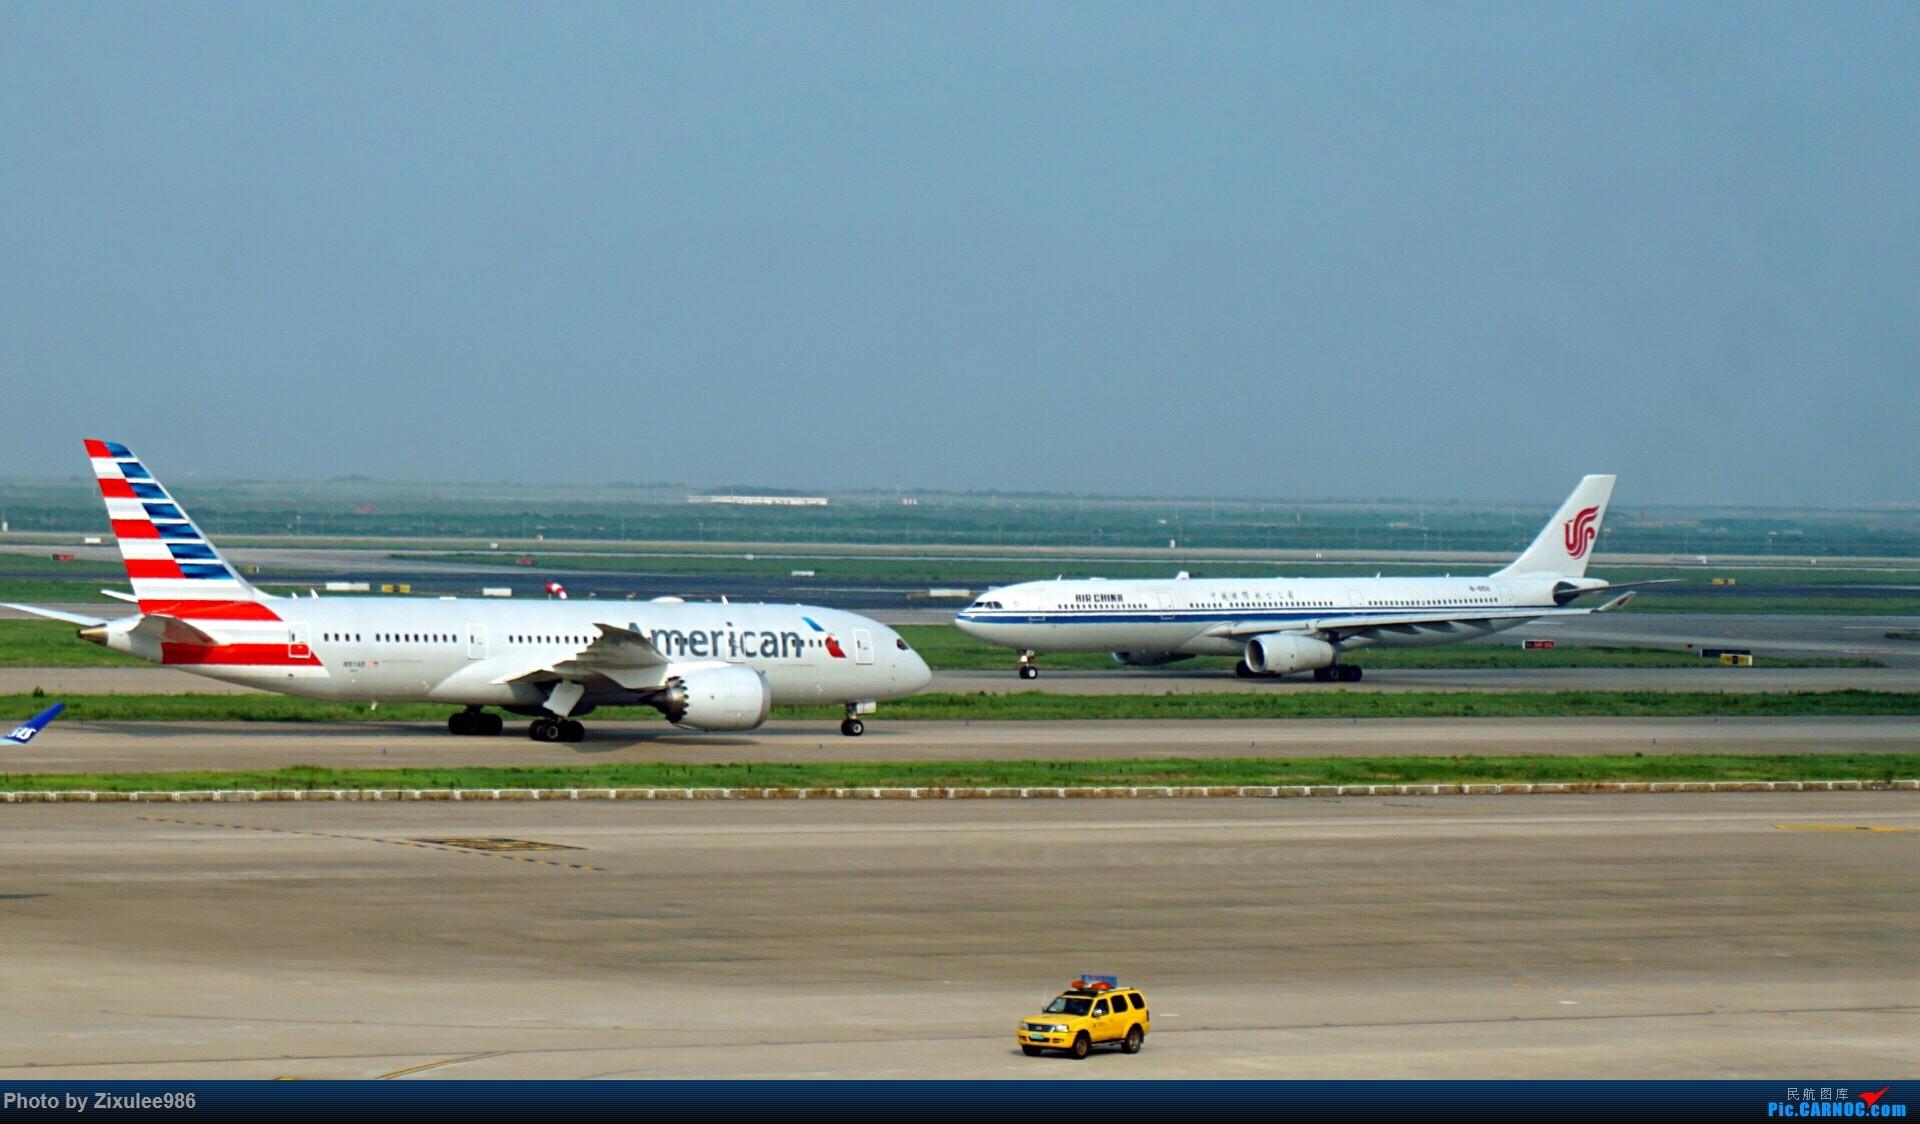 Re:[原创]加拿大21日游学之旅(一)~JJN-PVG-YYZ..(内含flightlog)~第一次发游记~多图缓更请谅解 BOEING 787-8 N817AN 中国上海浦东国际机场